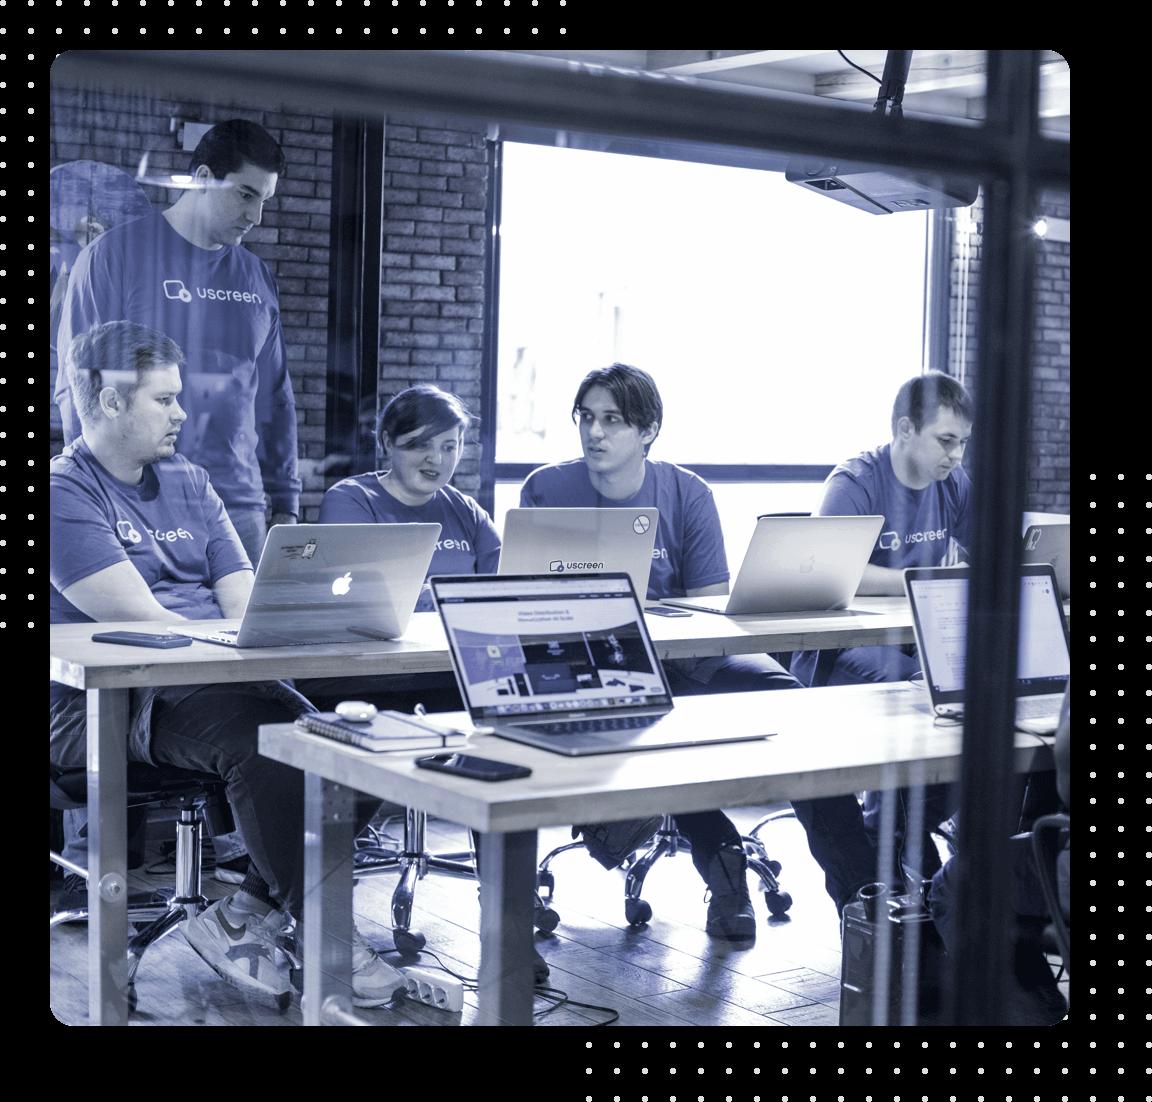 Uscreen team at work